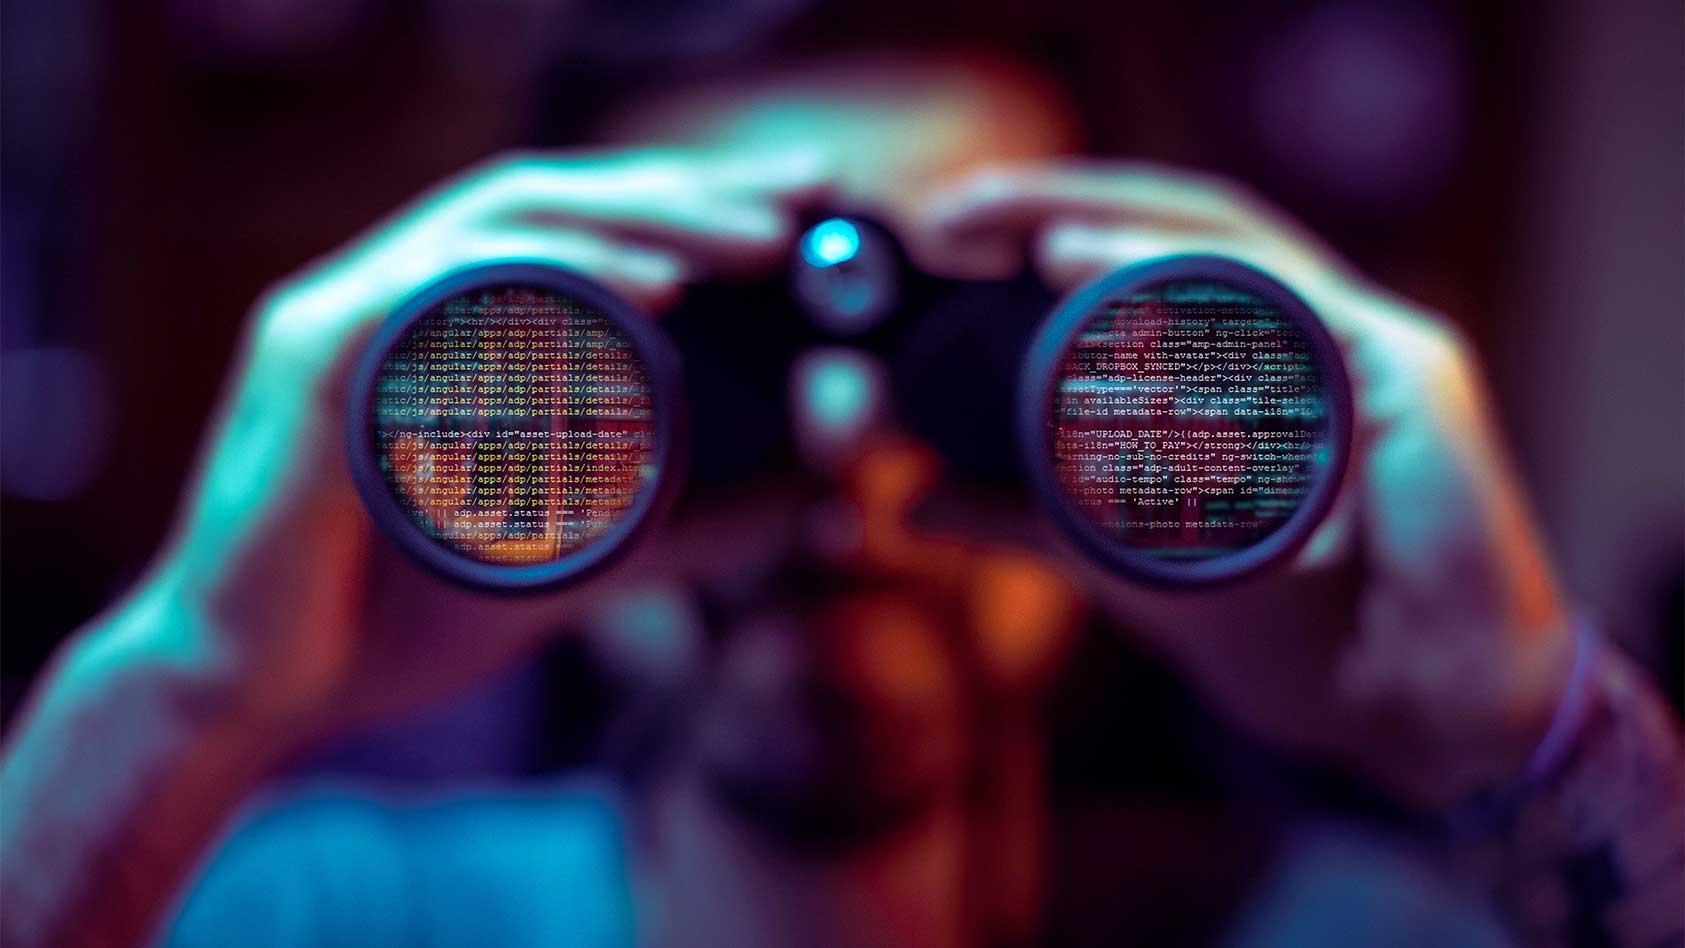 Man looking through binoculars with code superimposed on lenses